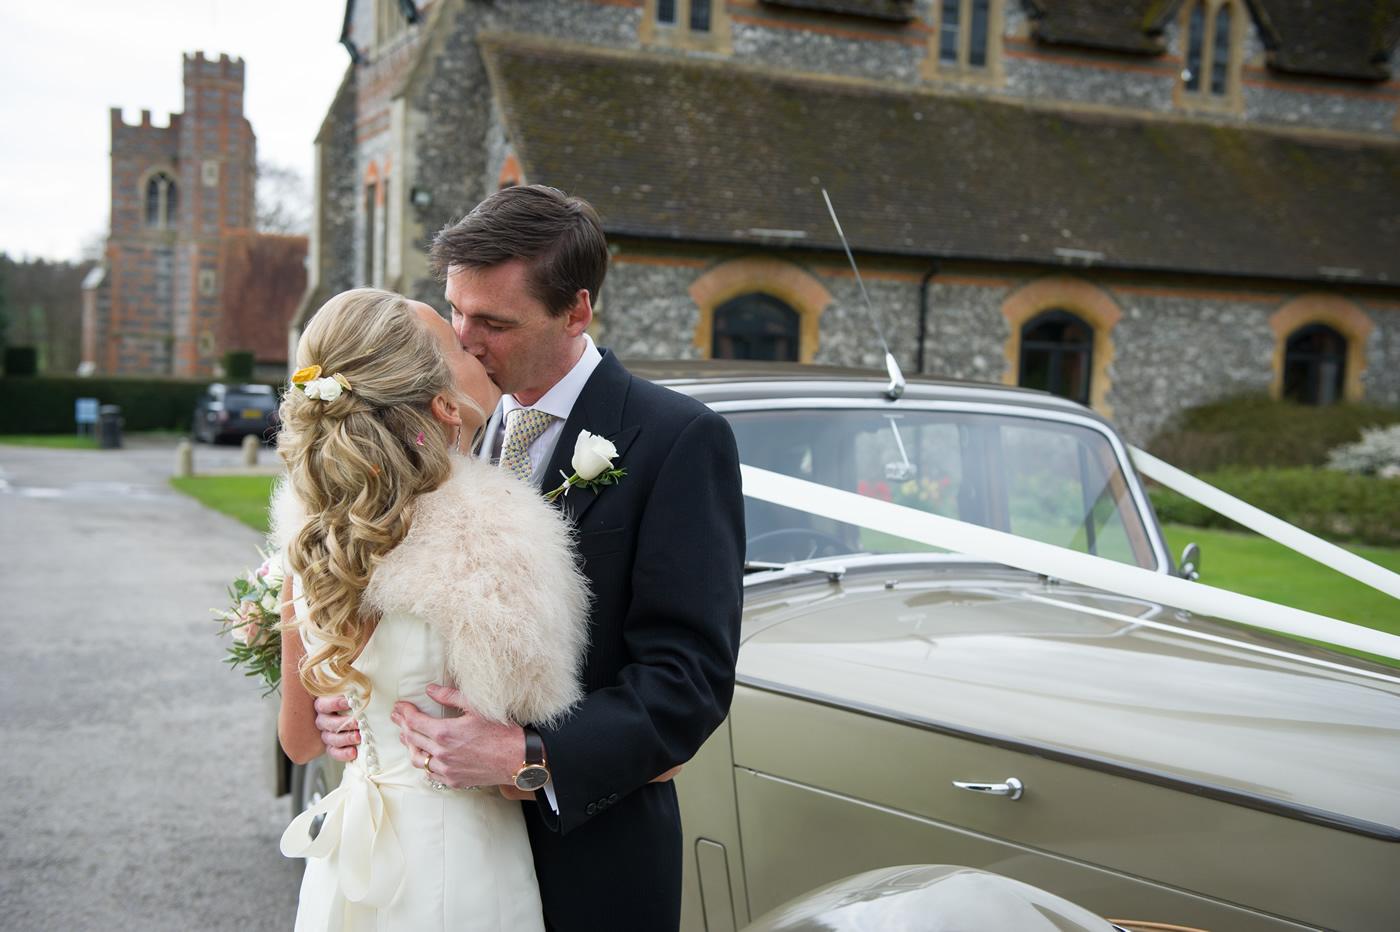 Bride & Groom Wedding Photograph Kissing Next To Car - Hair & Makeup For Bride in Berkshire, Surrey & surrounding areas